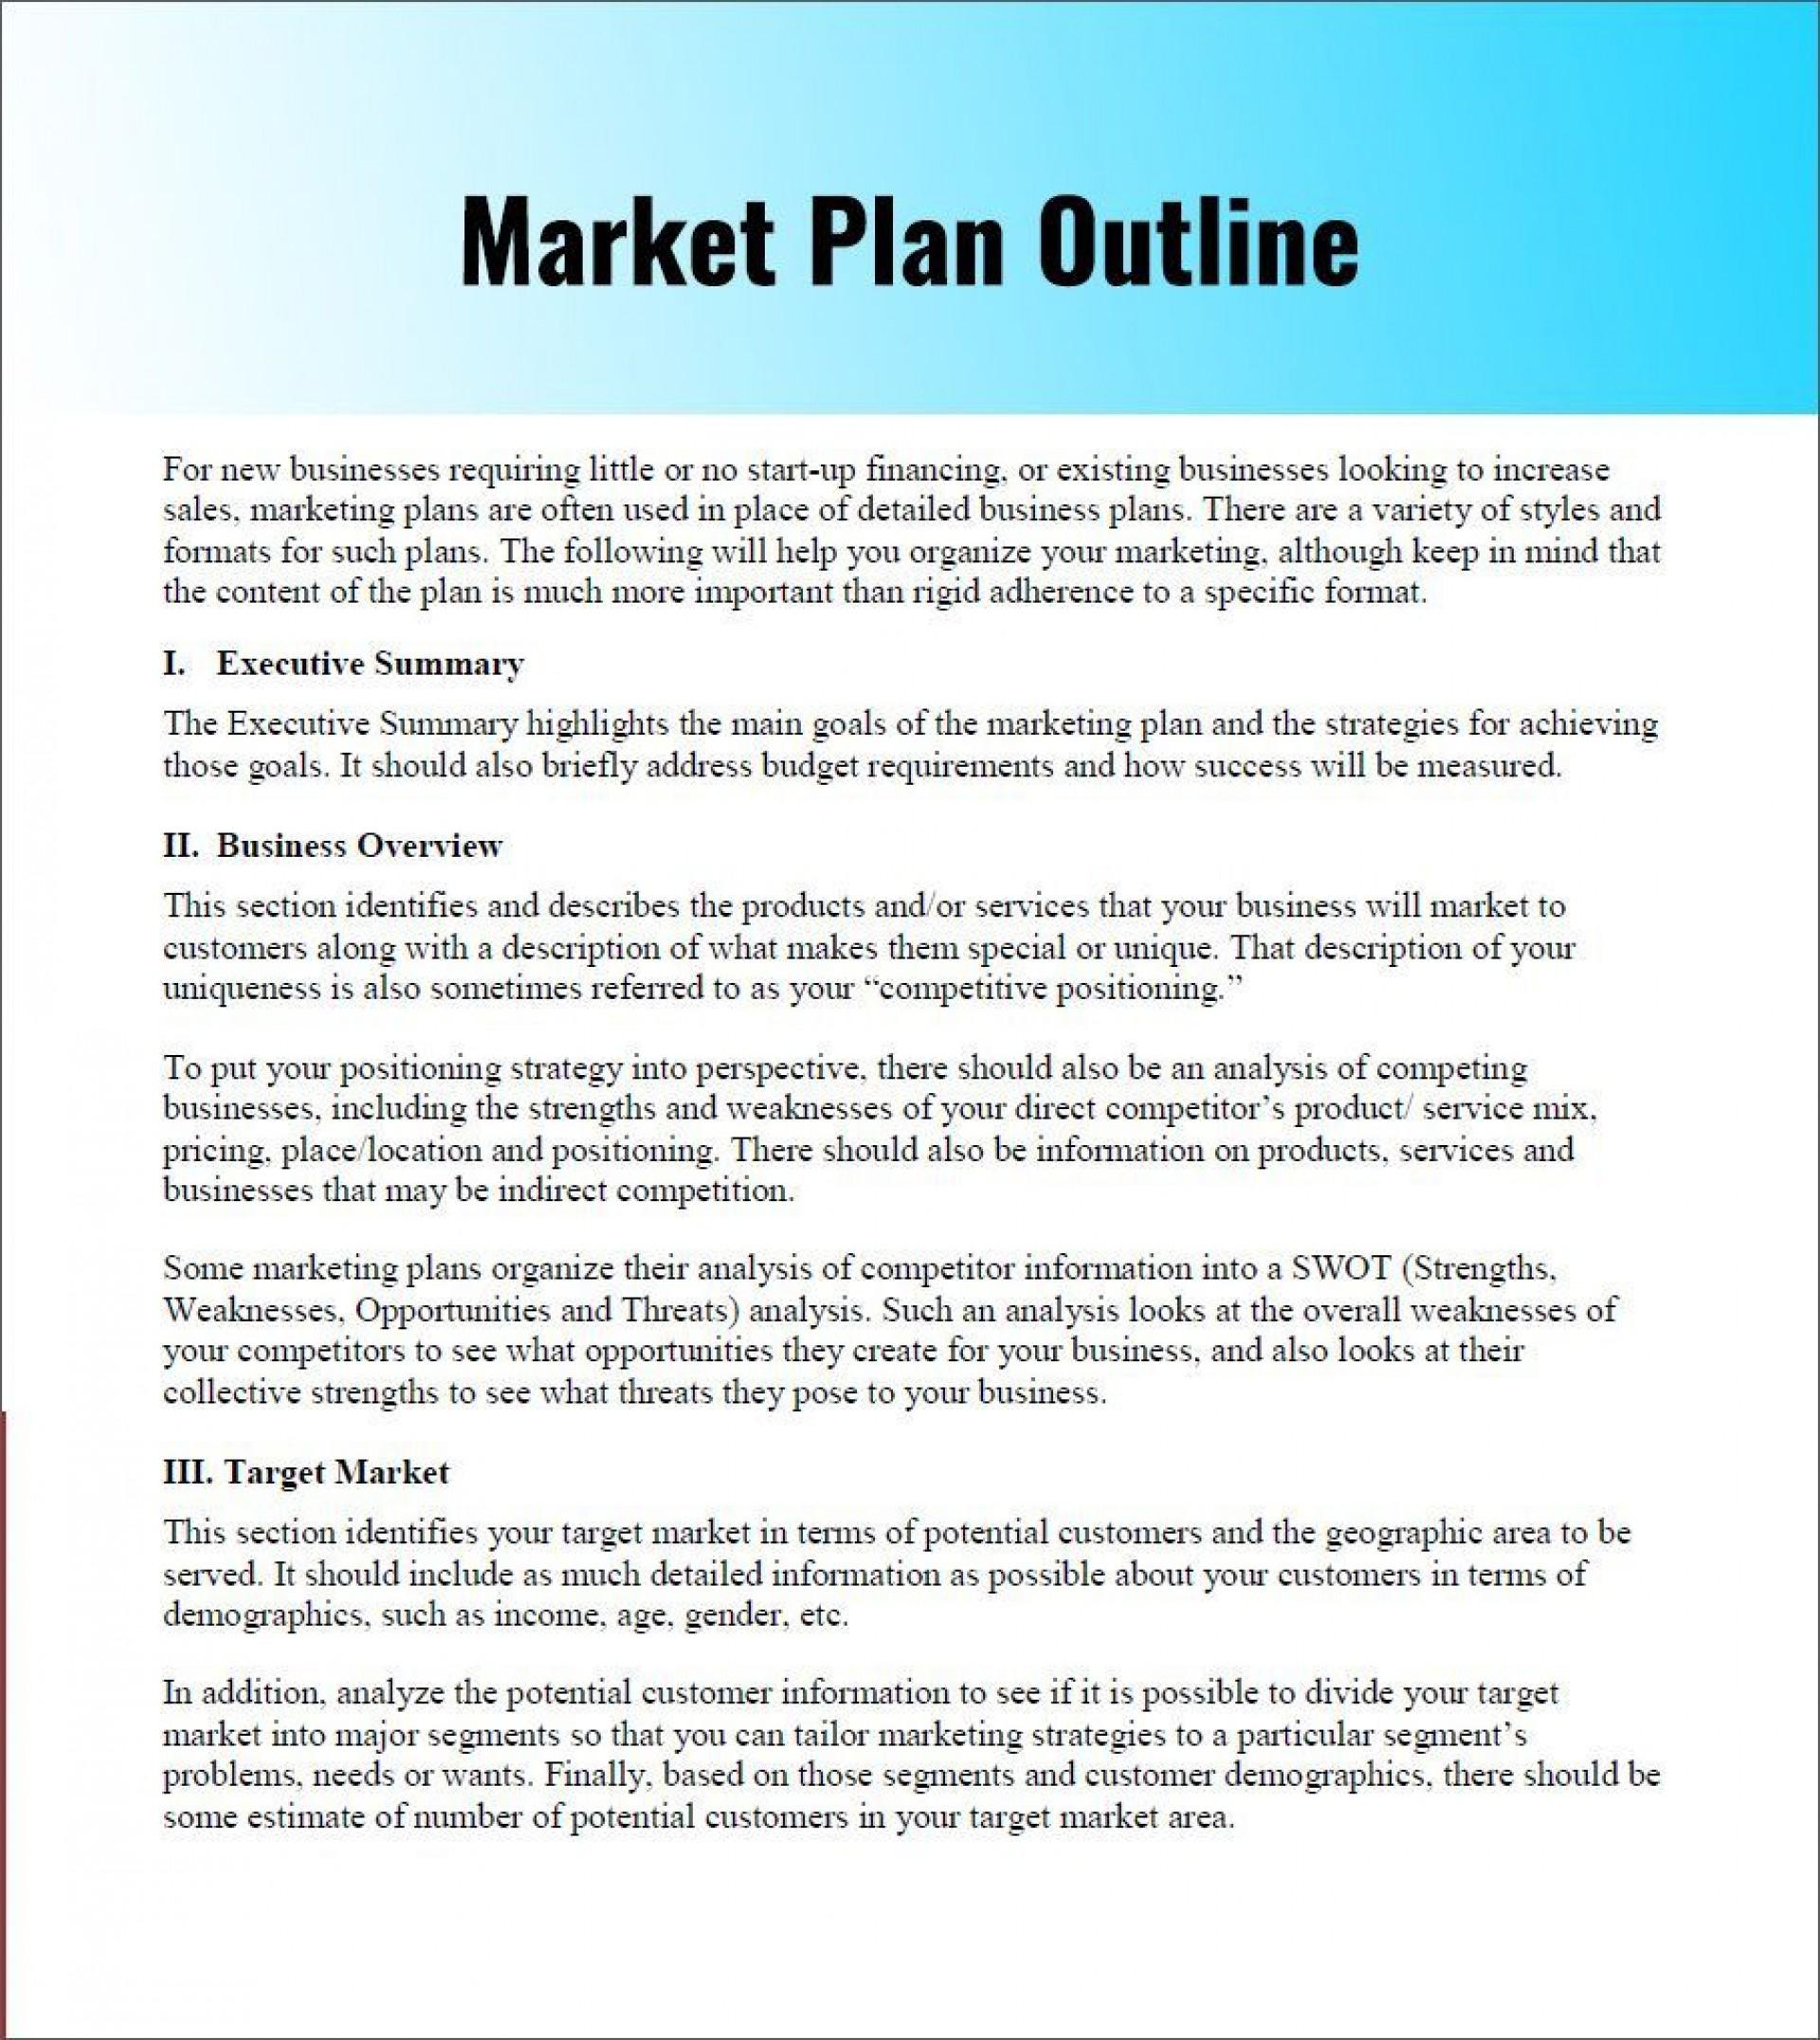 004 Phenomenal Digital Marketing Plan Example Pdf High Resolution  Free Template Busines Sample1920